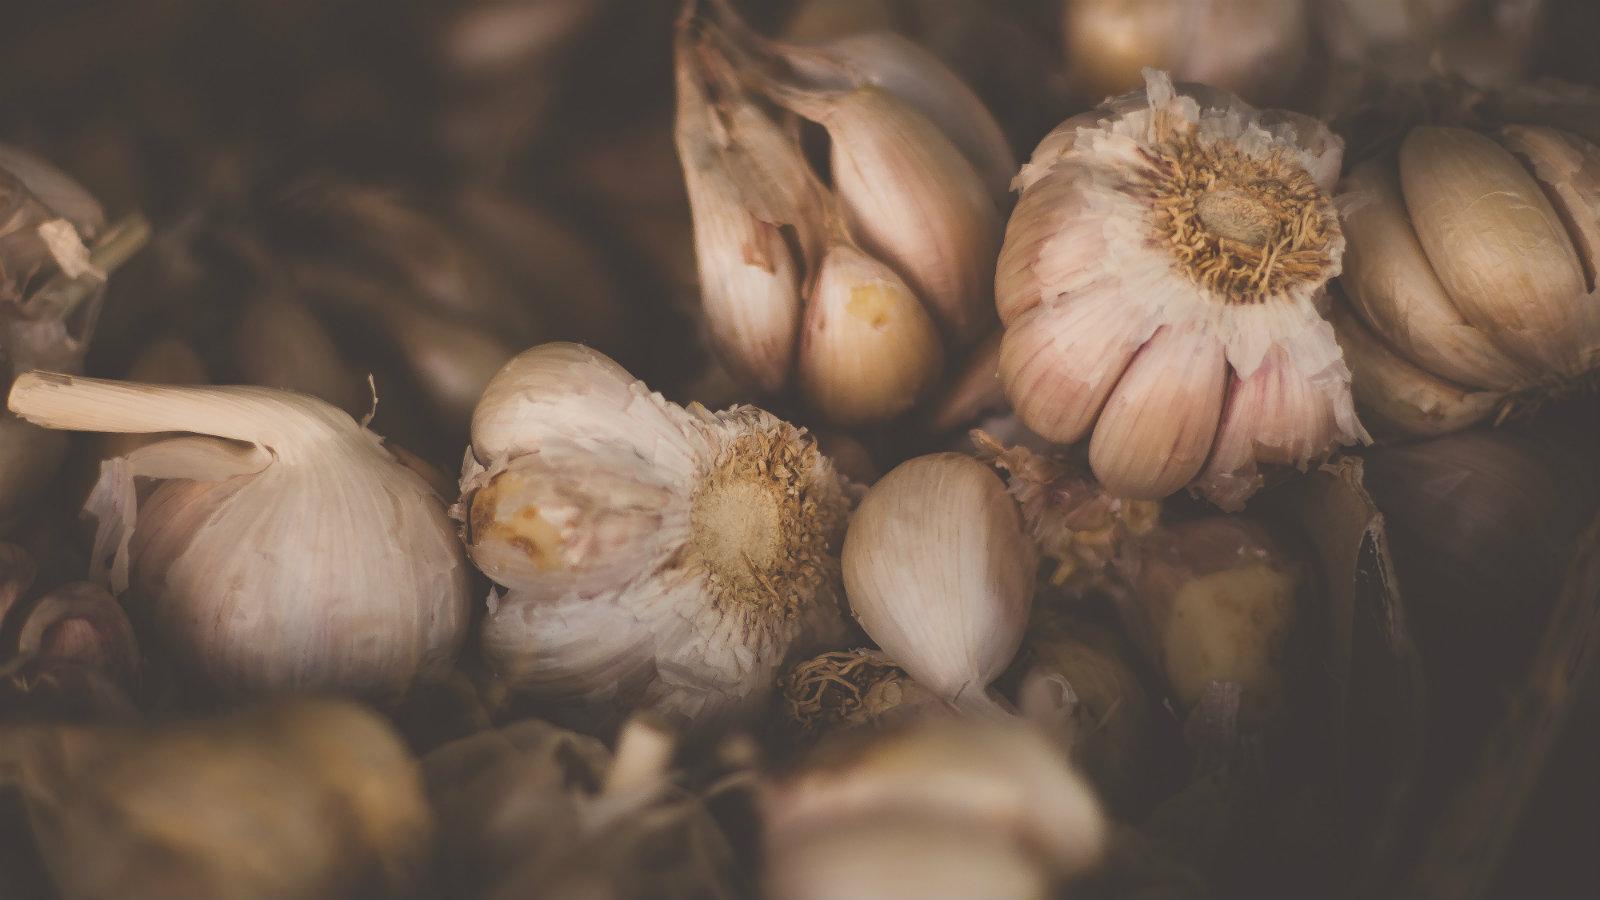 India-aphrodisiac-garlic